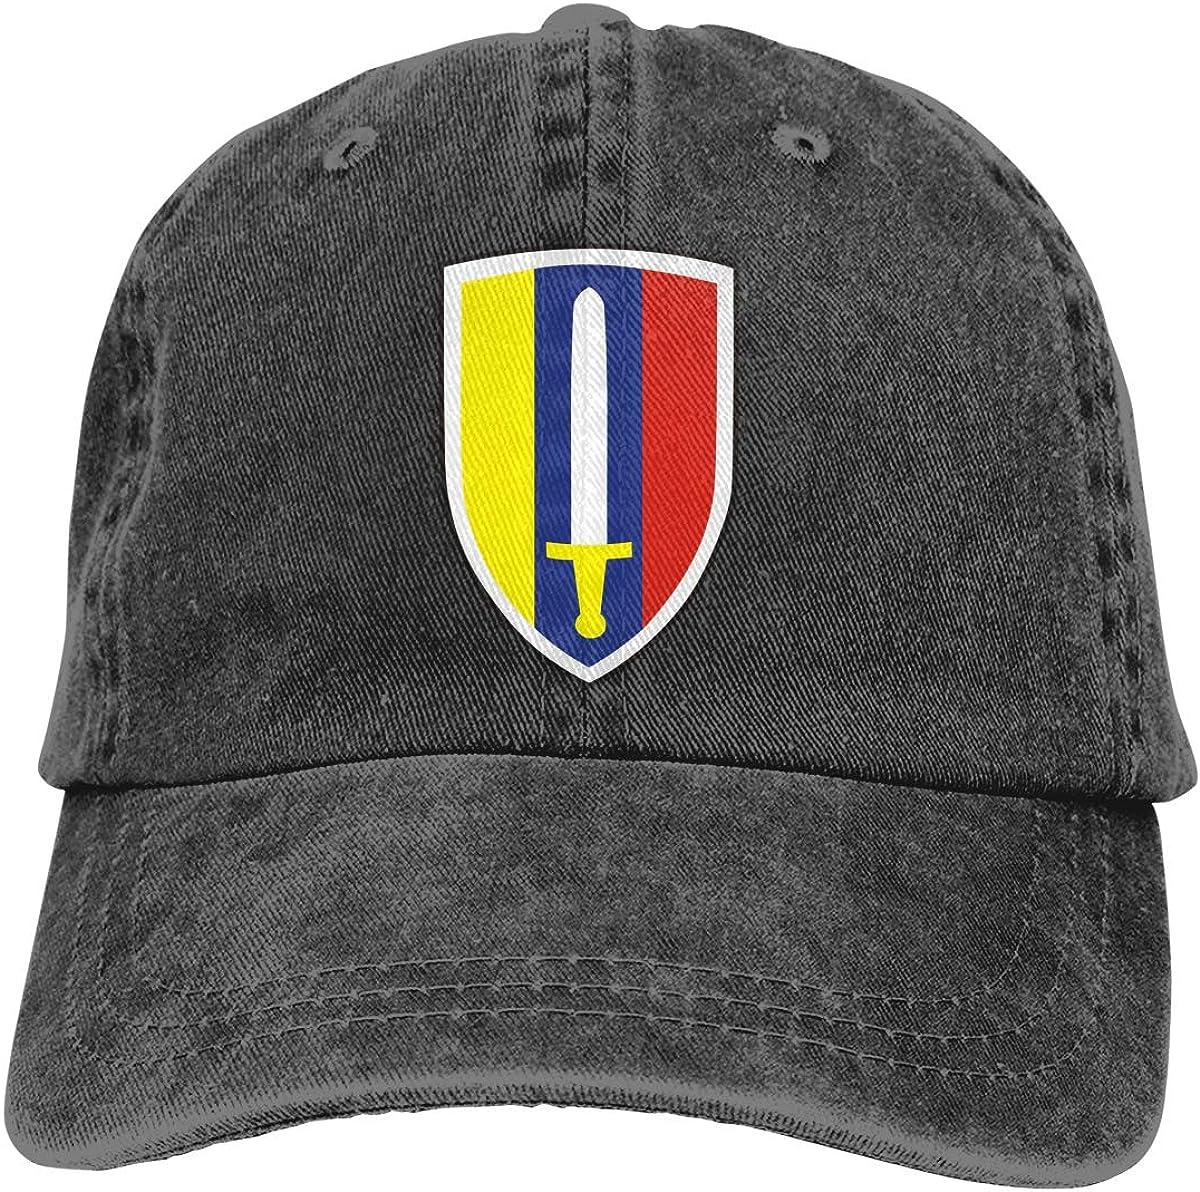 U.S Army Vietnam Usarv Sticker Decal Adult Unisex Classic American Style Printing Adjustable Denim Cowboy Hat